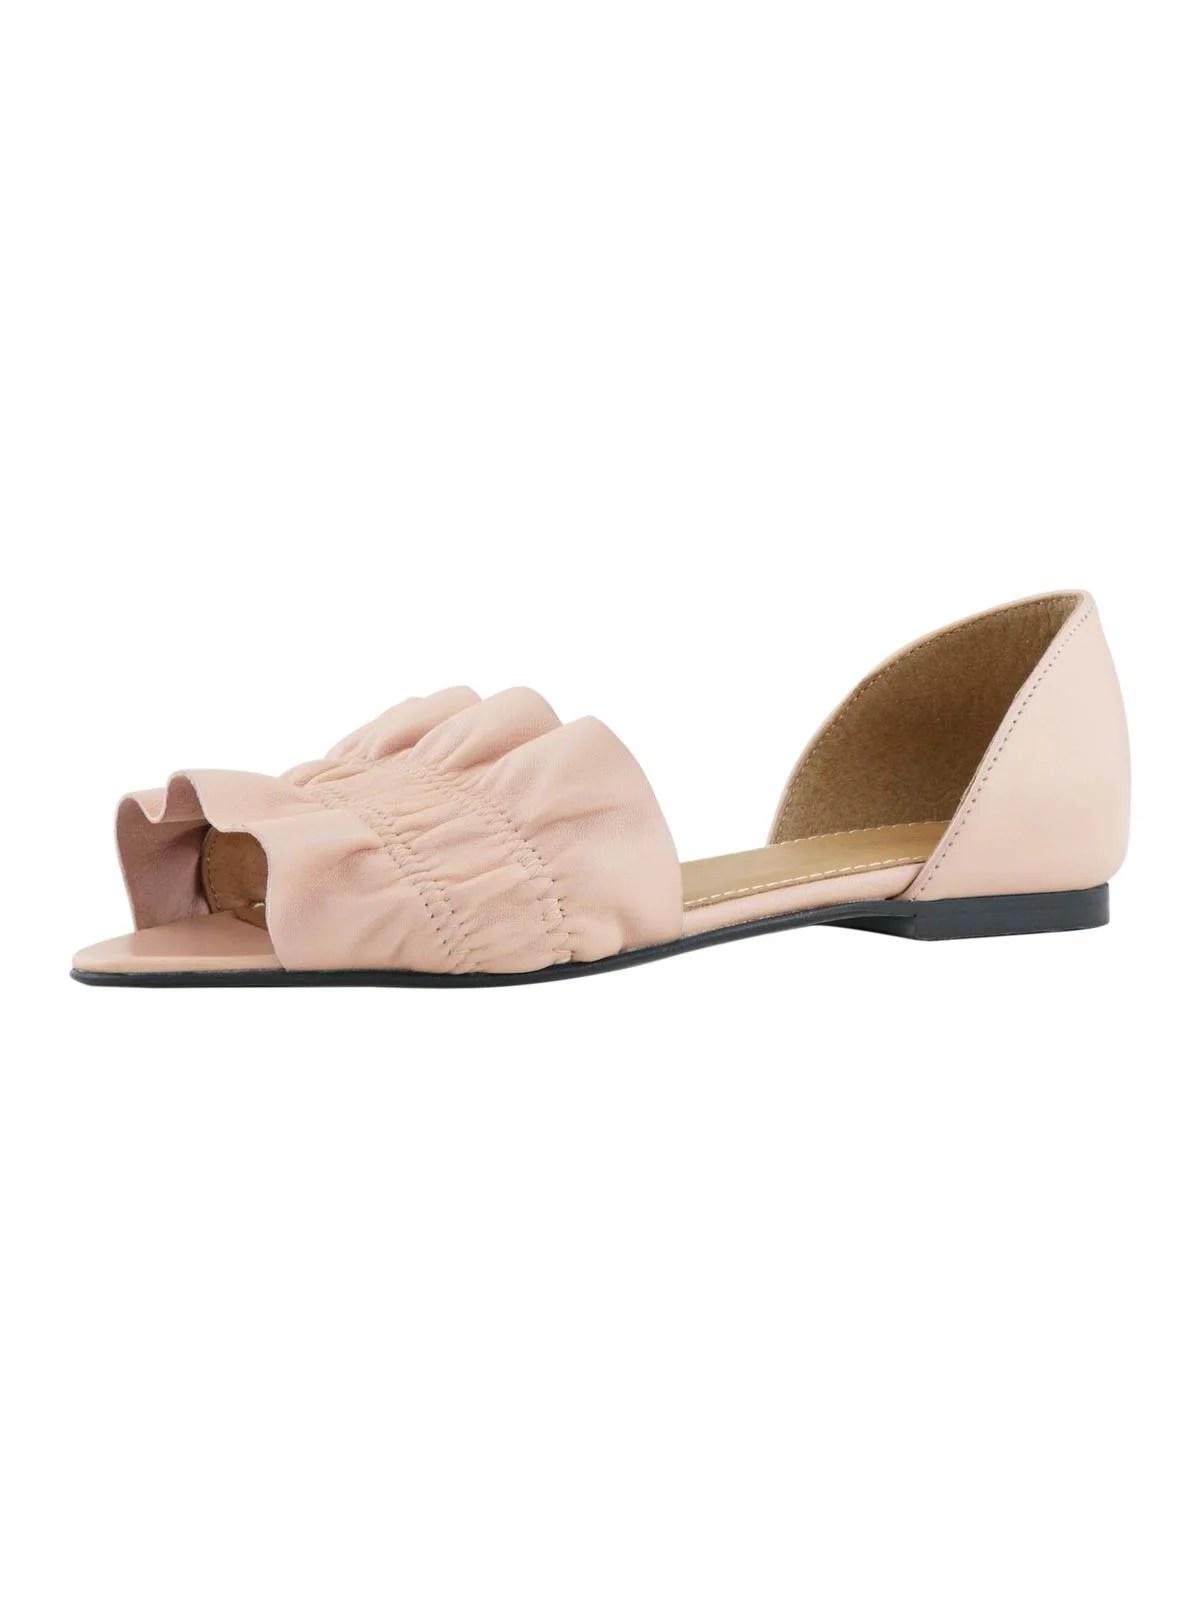 507.862 HEINE Damen Designer-Peeptoe-Ballerina Rosé